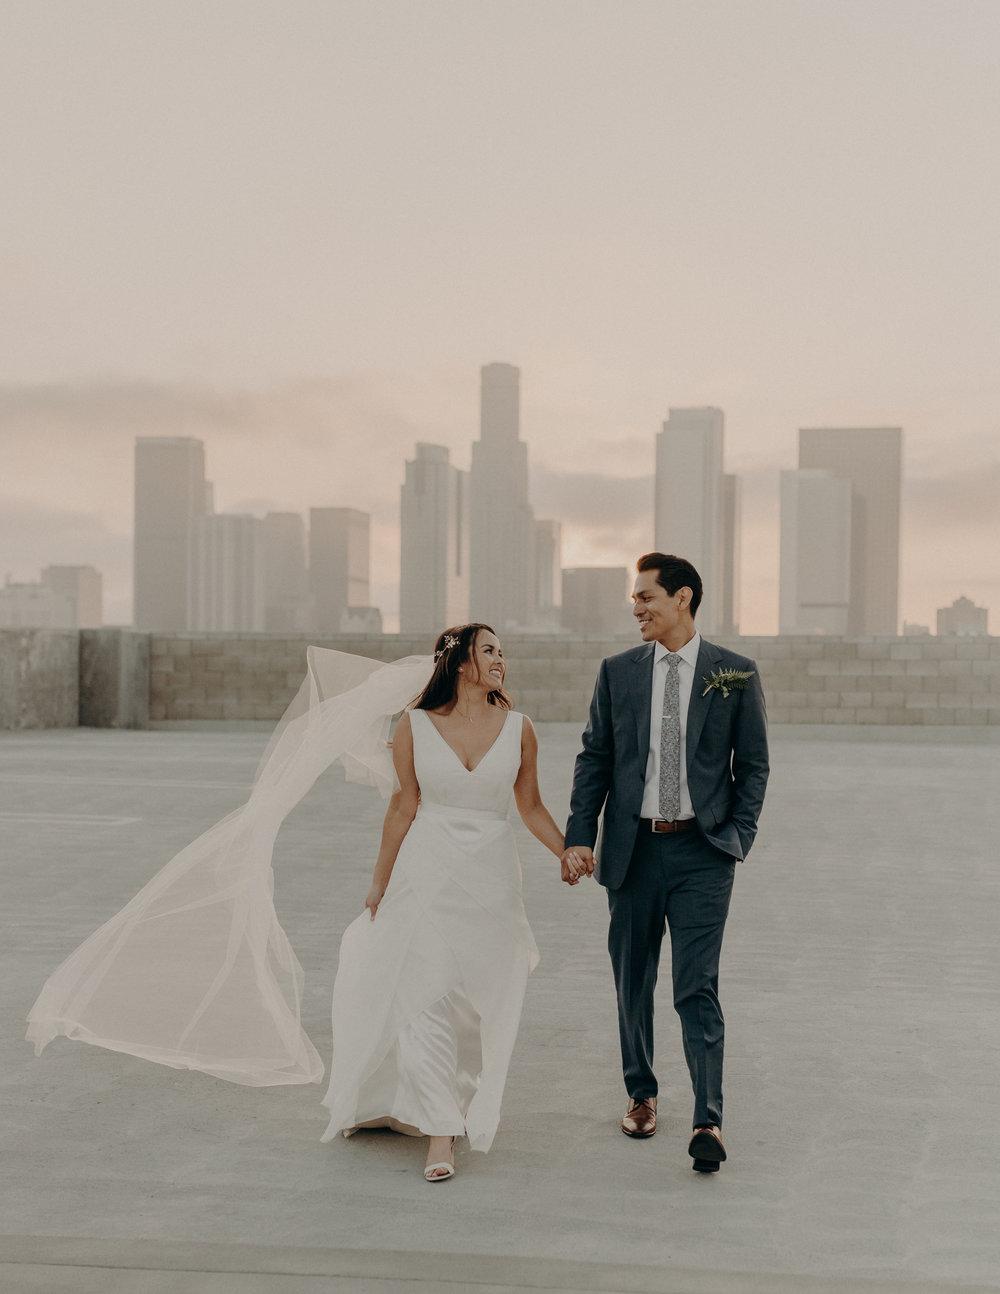 dtla wedding venue photographer